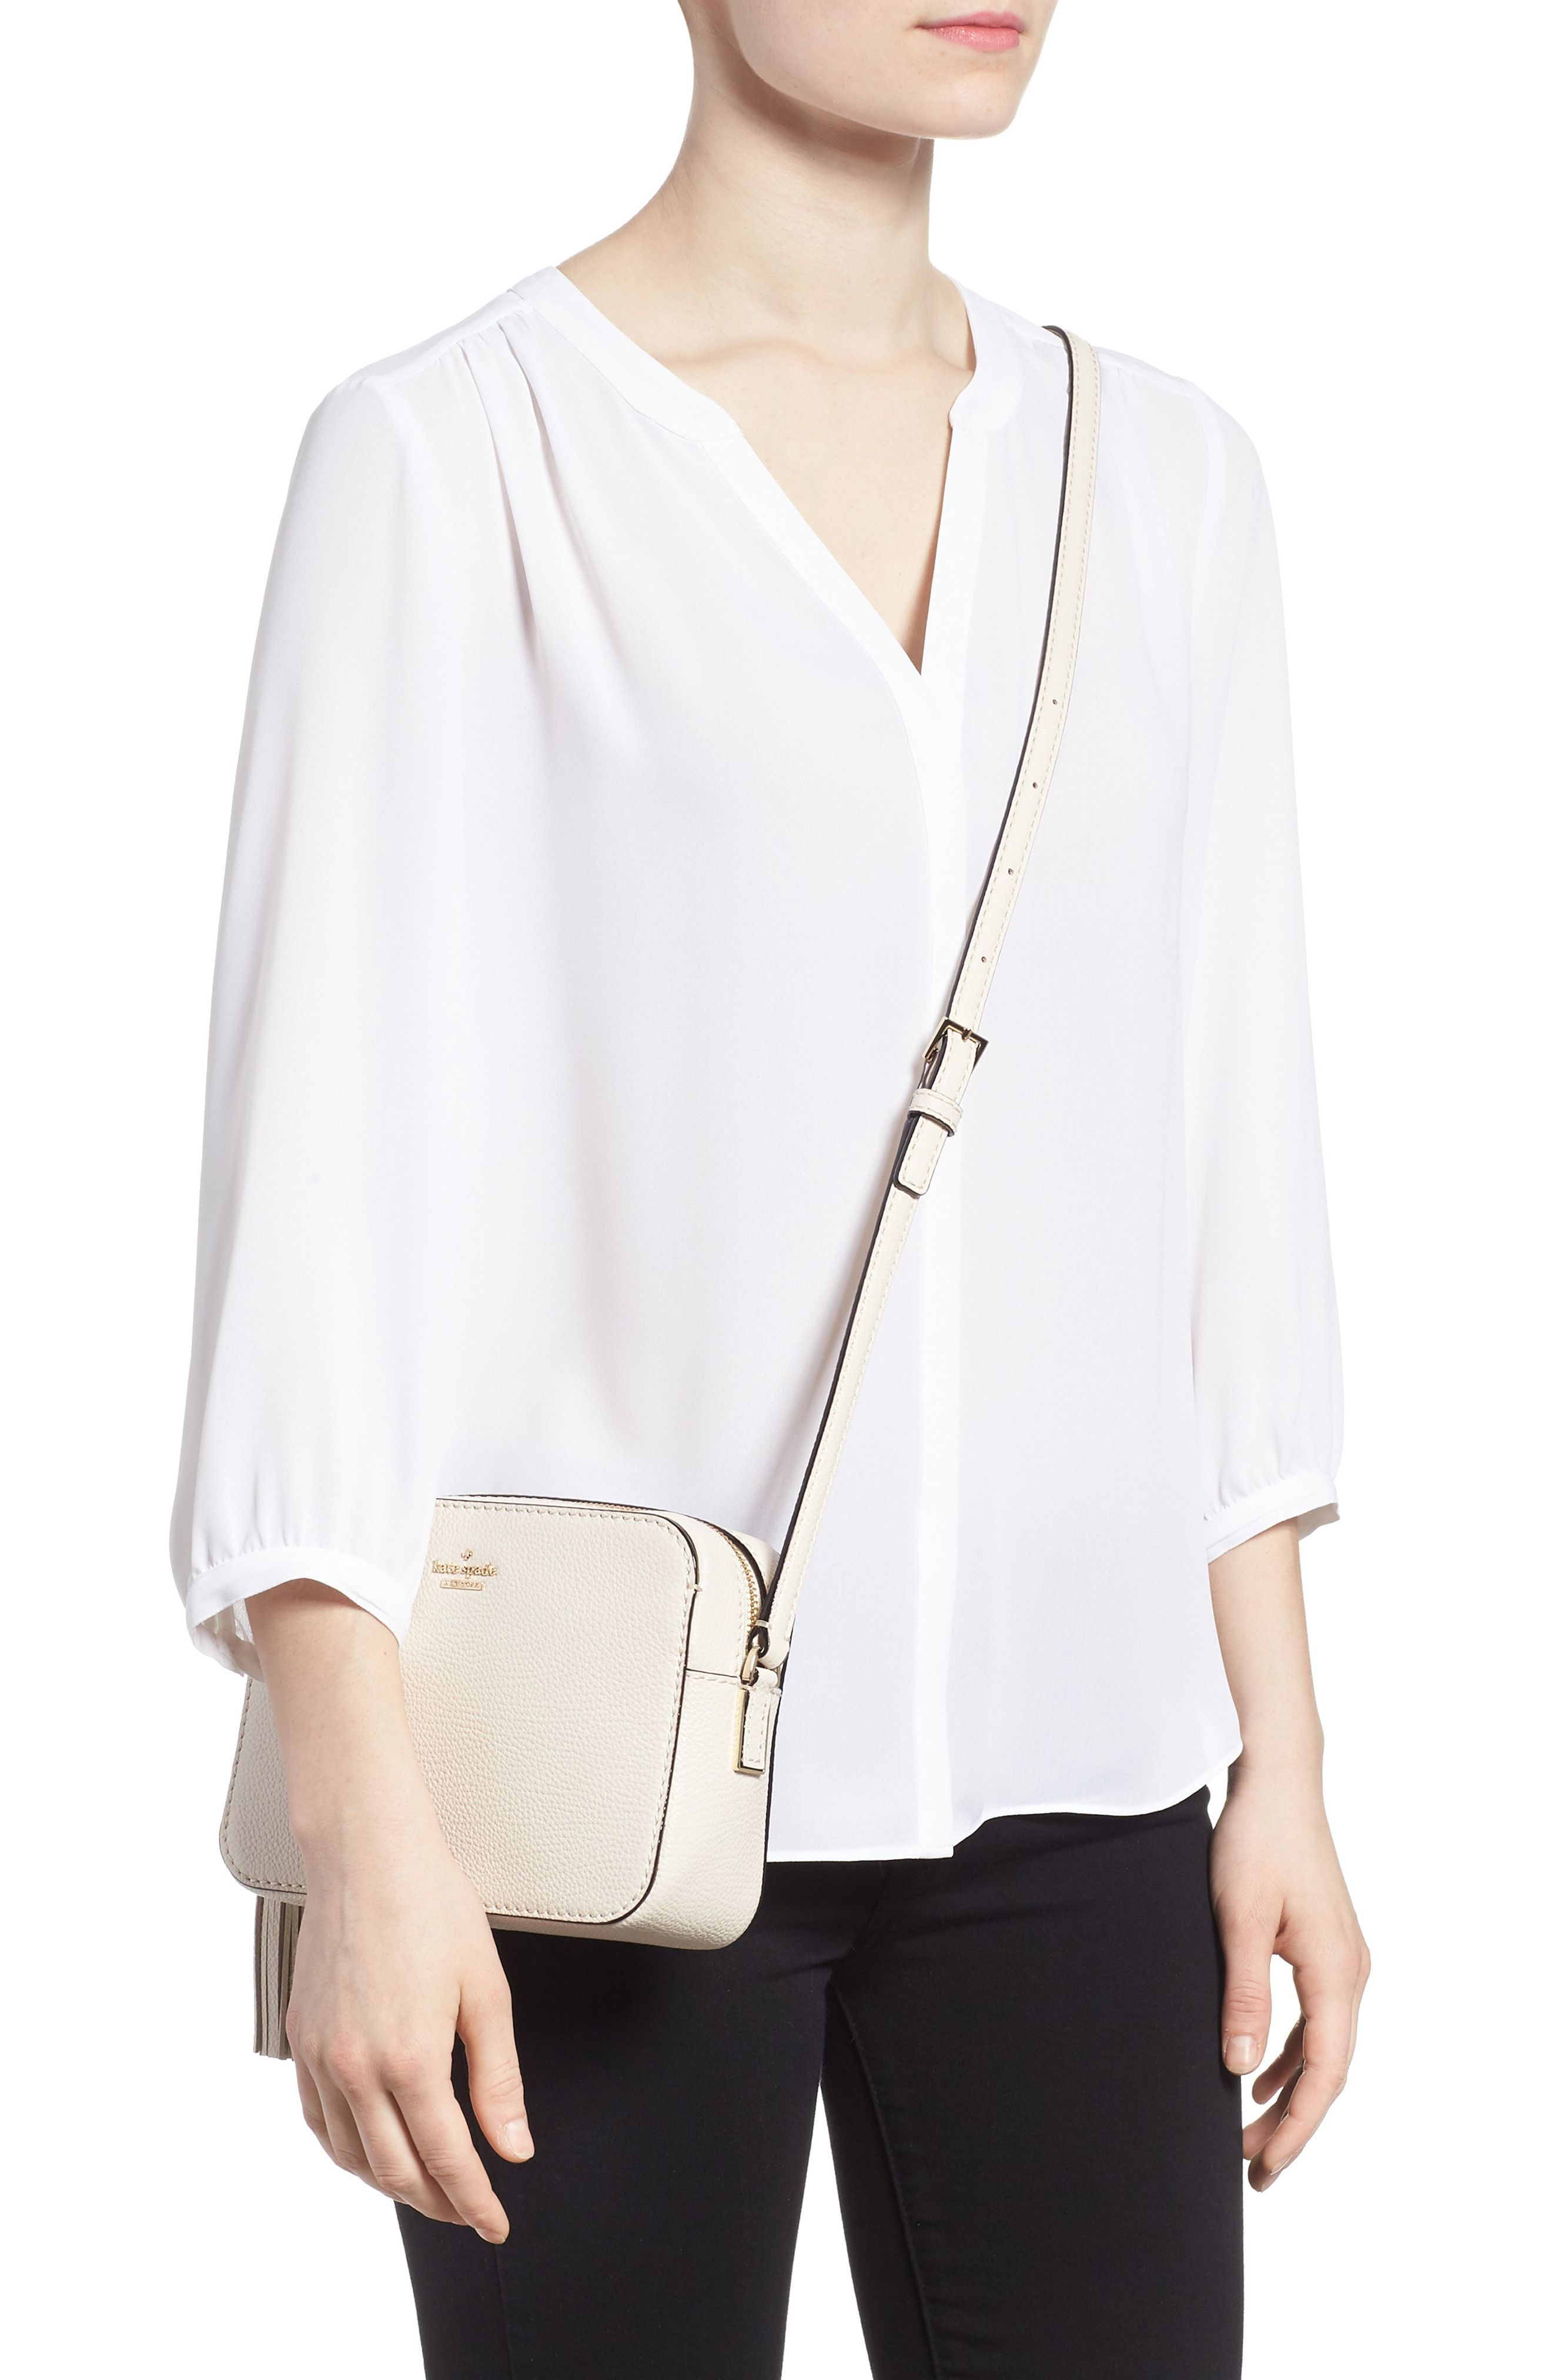 0d5bfb5c10bf KATE SPADE Kingston Drive - Arla Leather Crossbody Bag - White ...